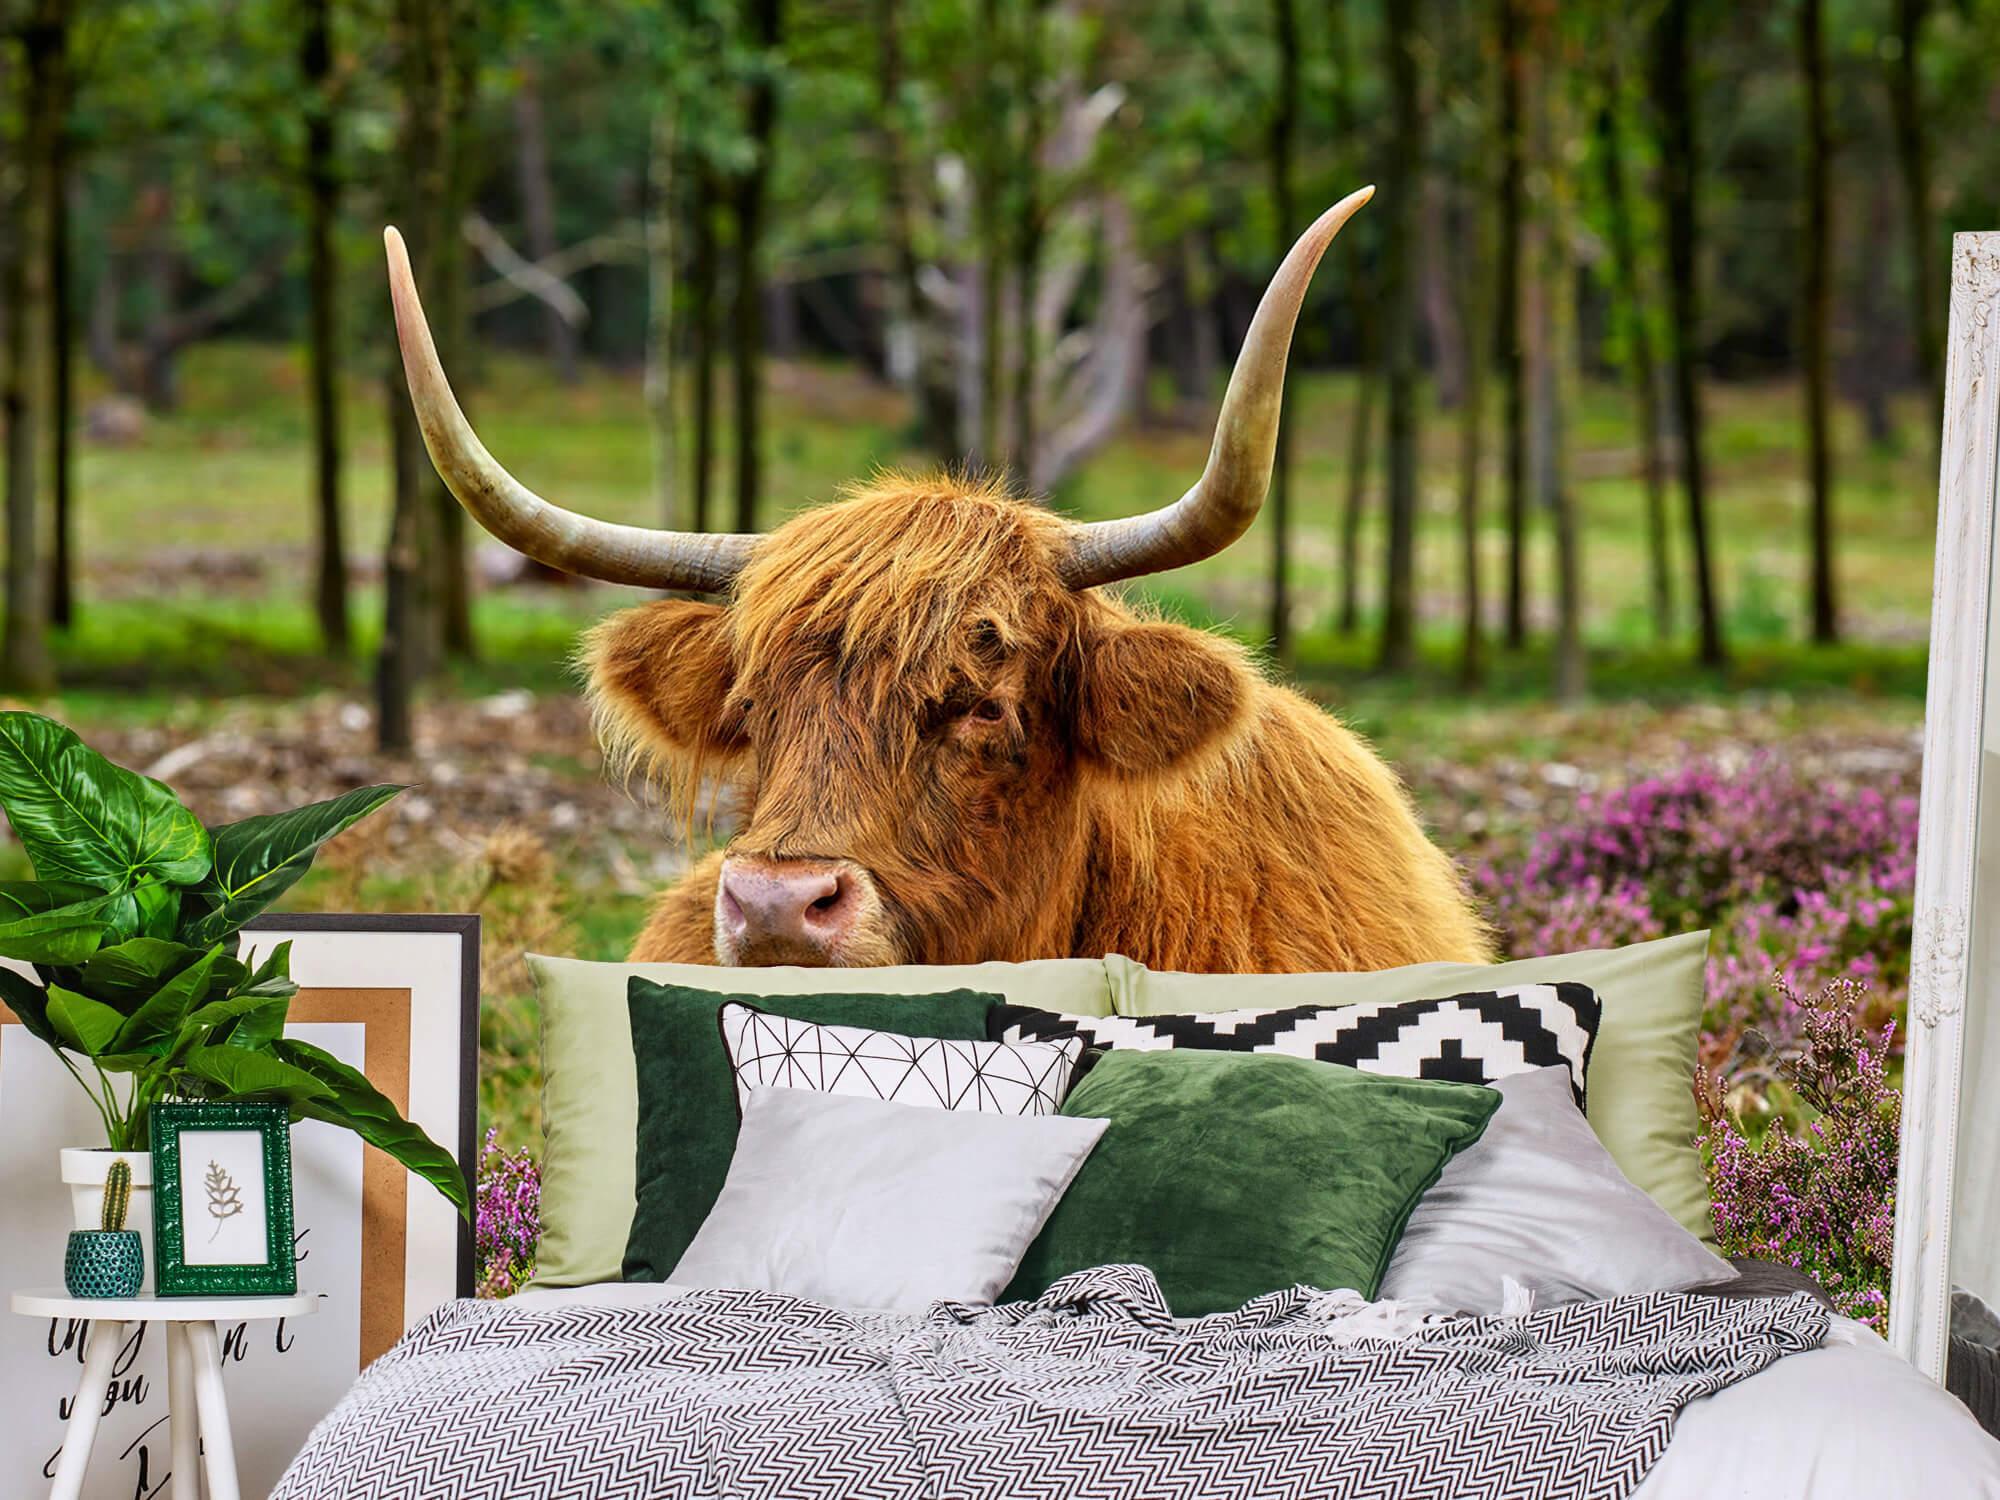 Hooglanders - Schotse hooglander tussen paarse heide 12